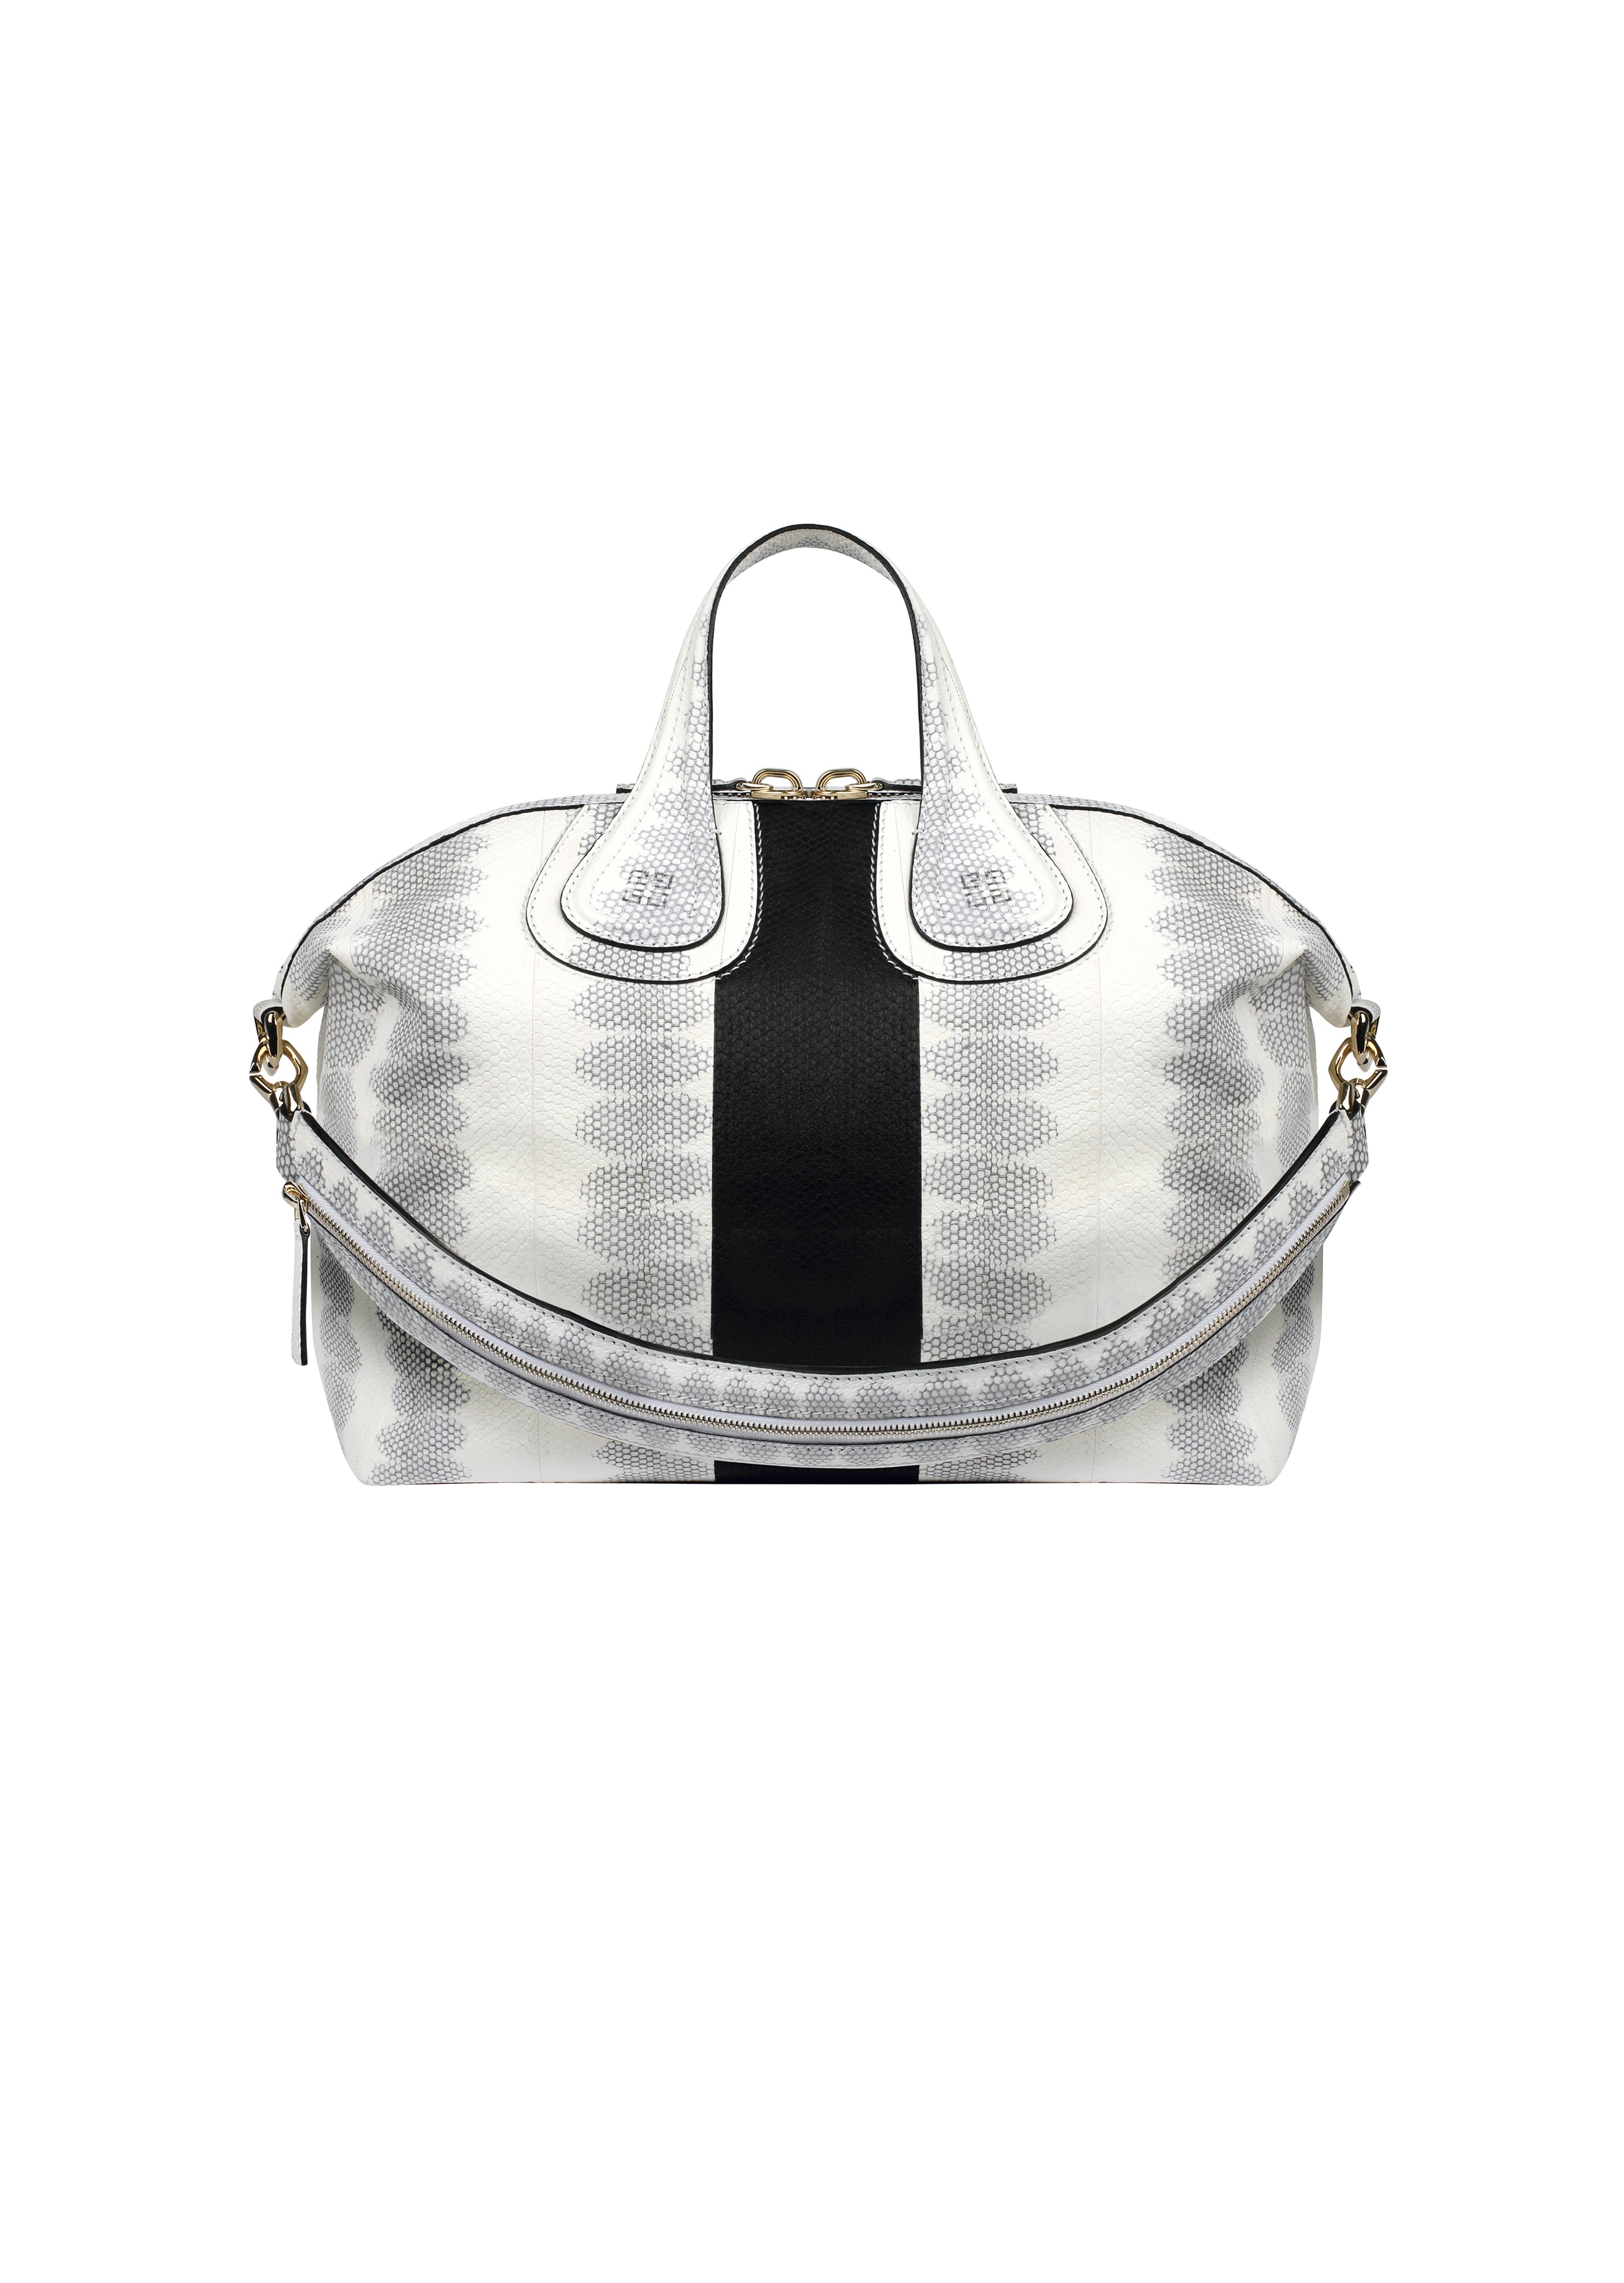 Givenchy borse, foto